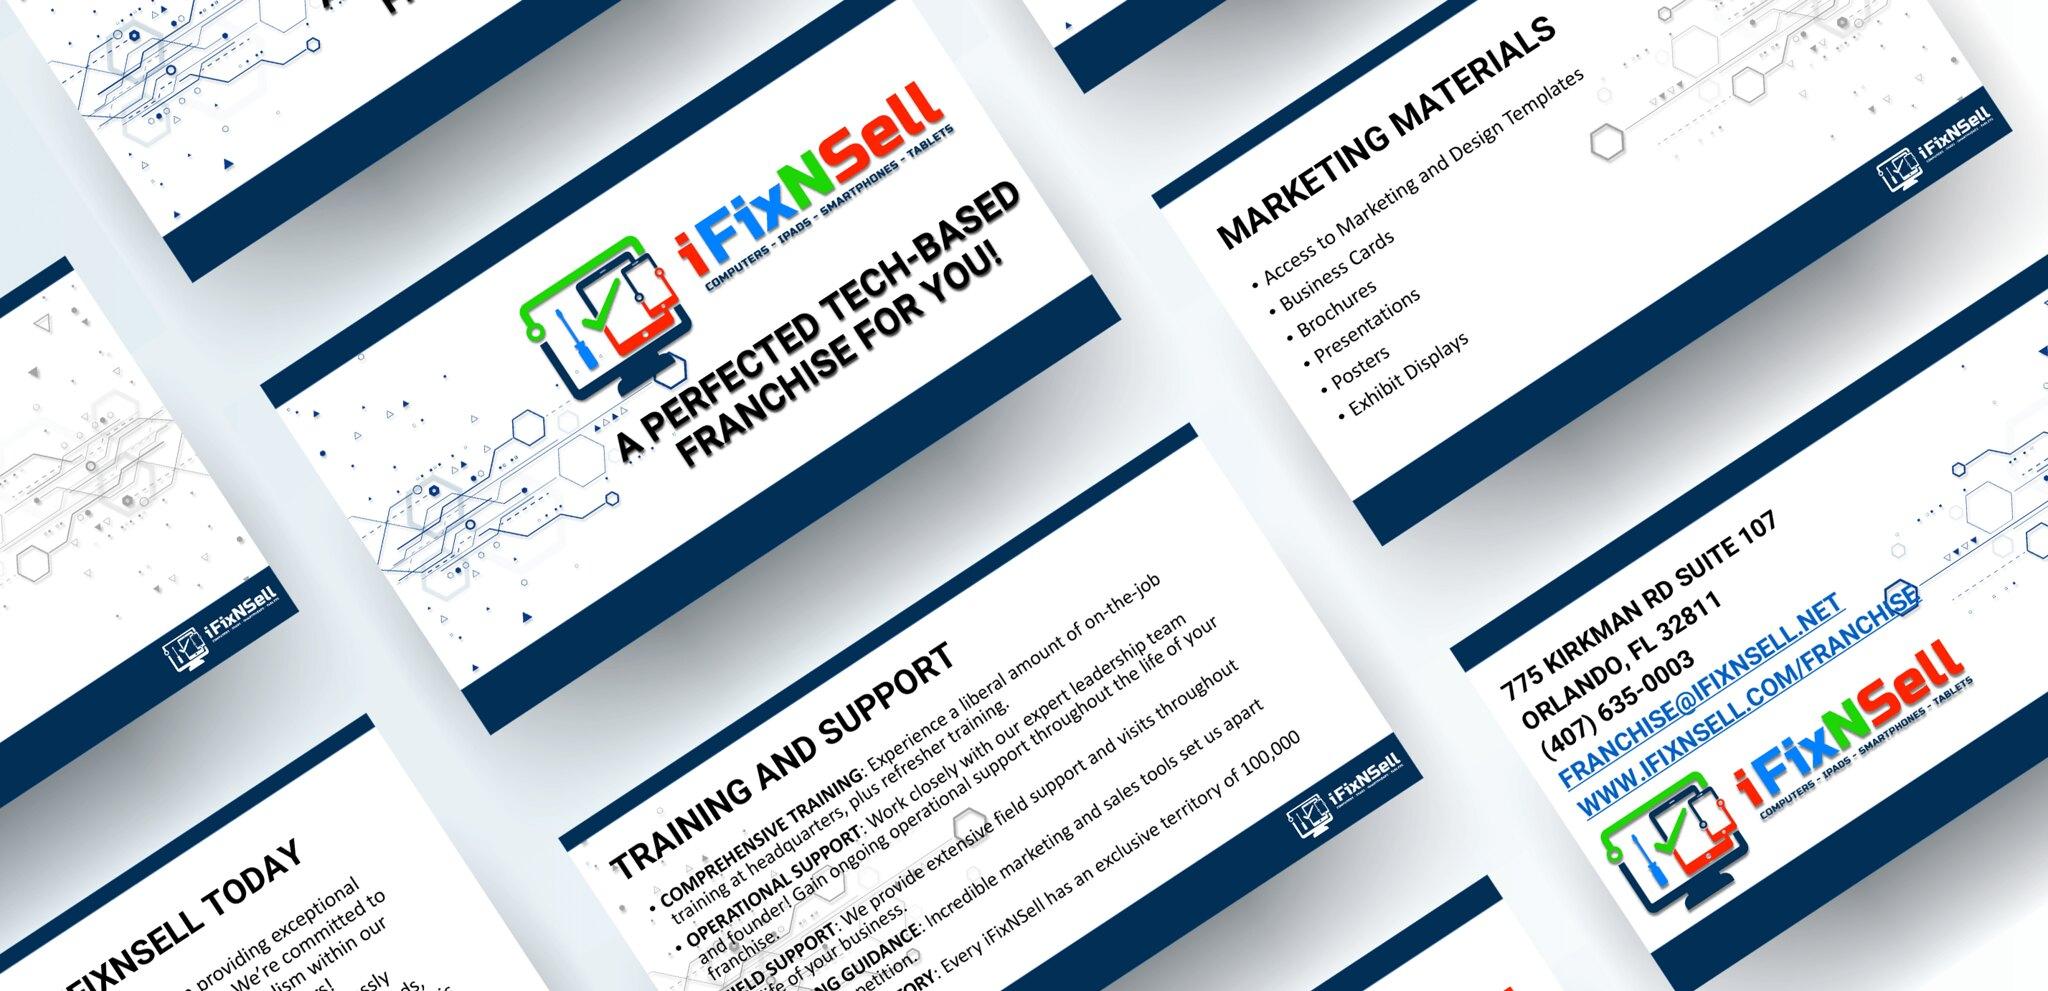 iFixNSell Presentation Digital Collateral Design Tuyen Chau